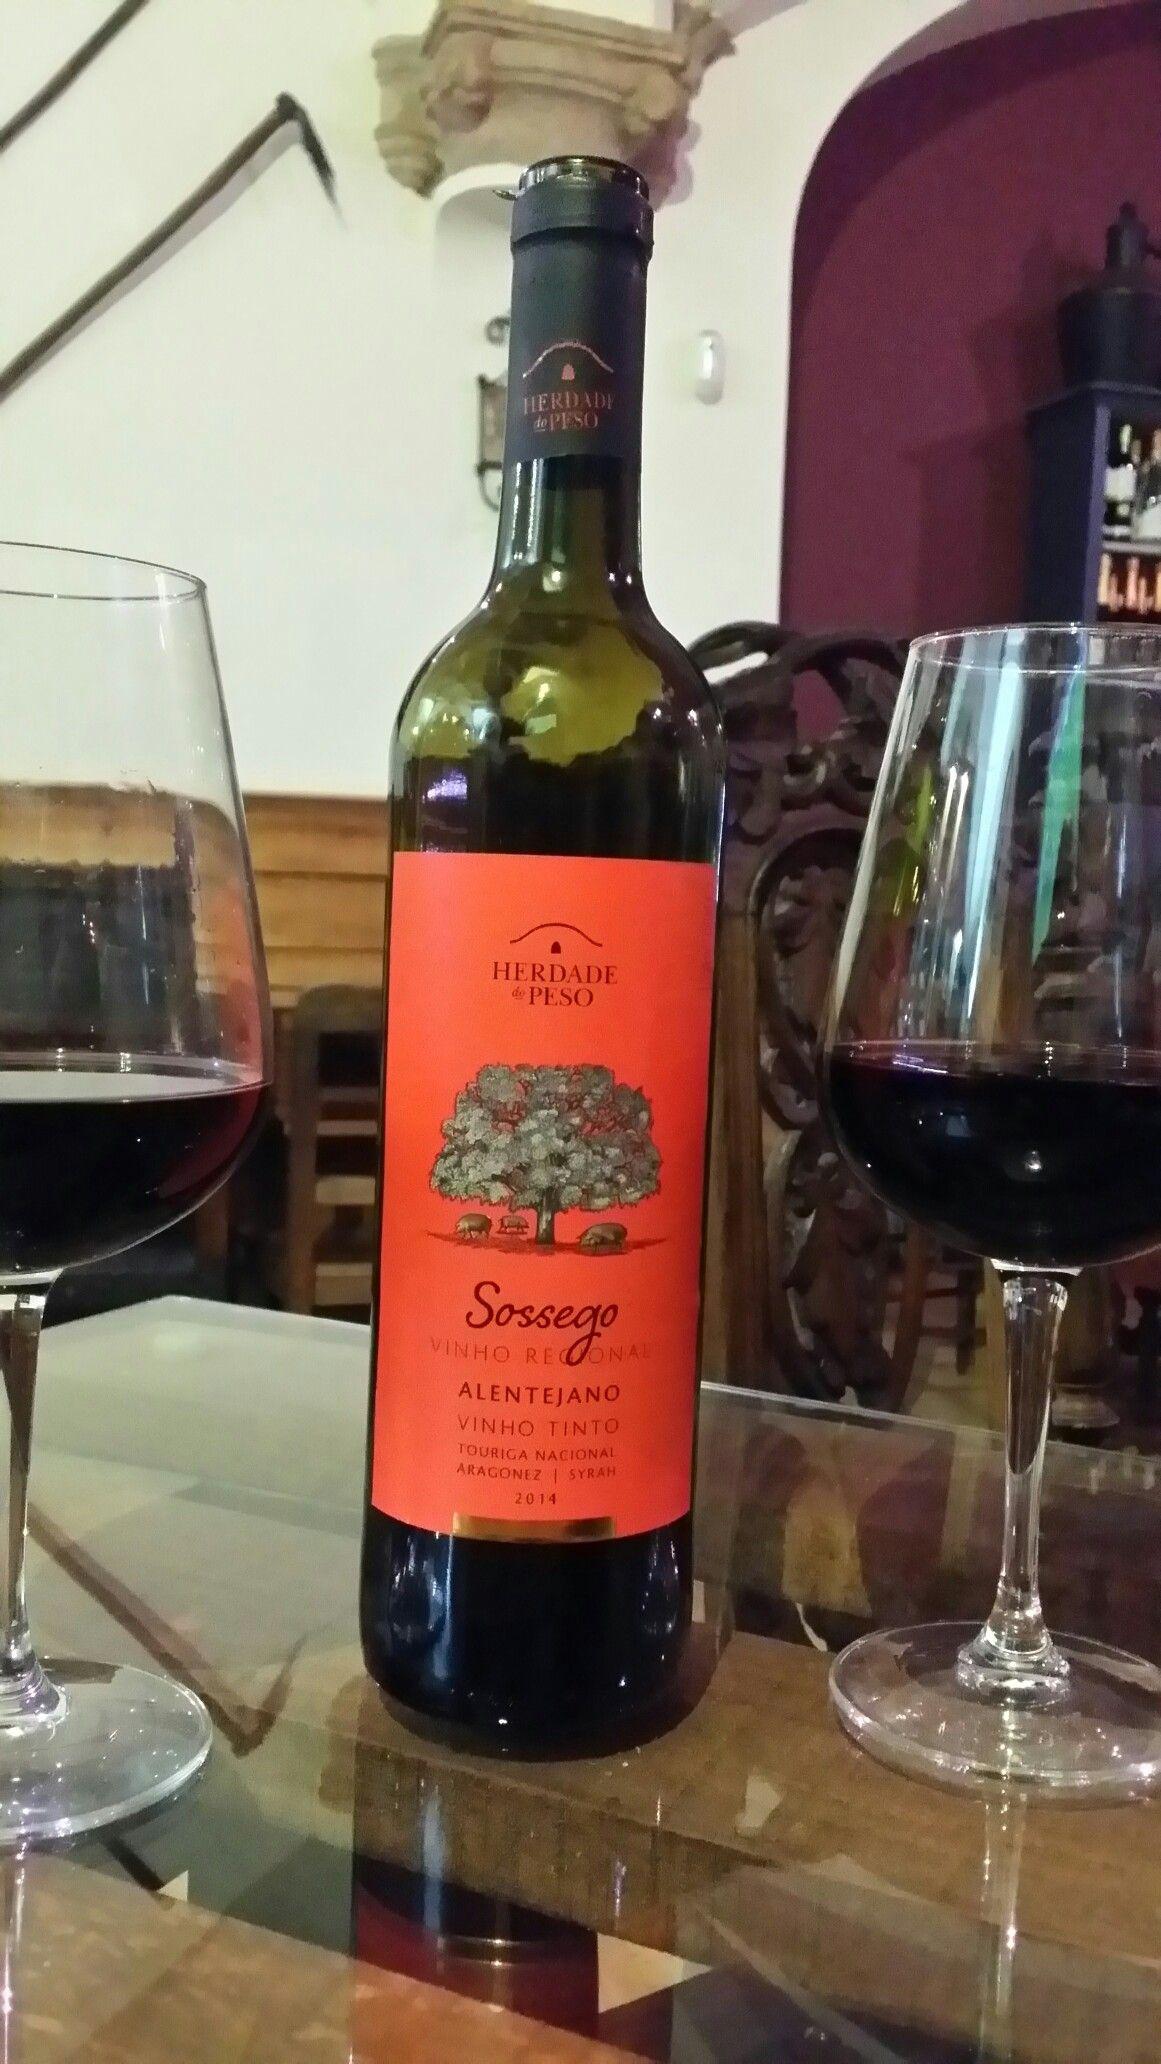 Red Wine Herdade Do Peso Sossego 2015 Alentejo Vinho Tinto Wine Herdade